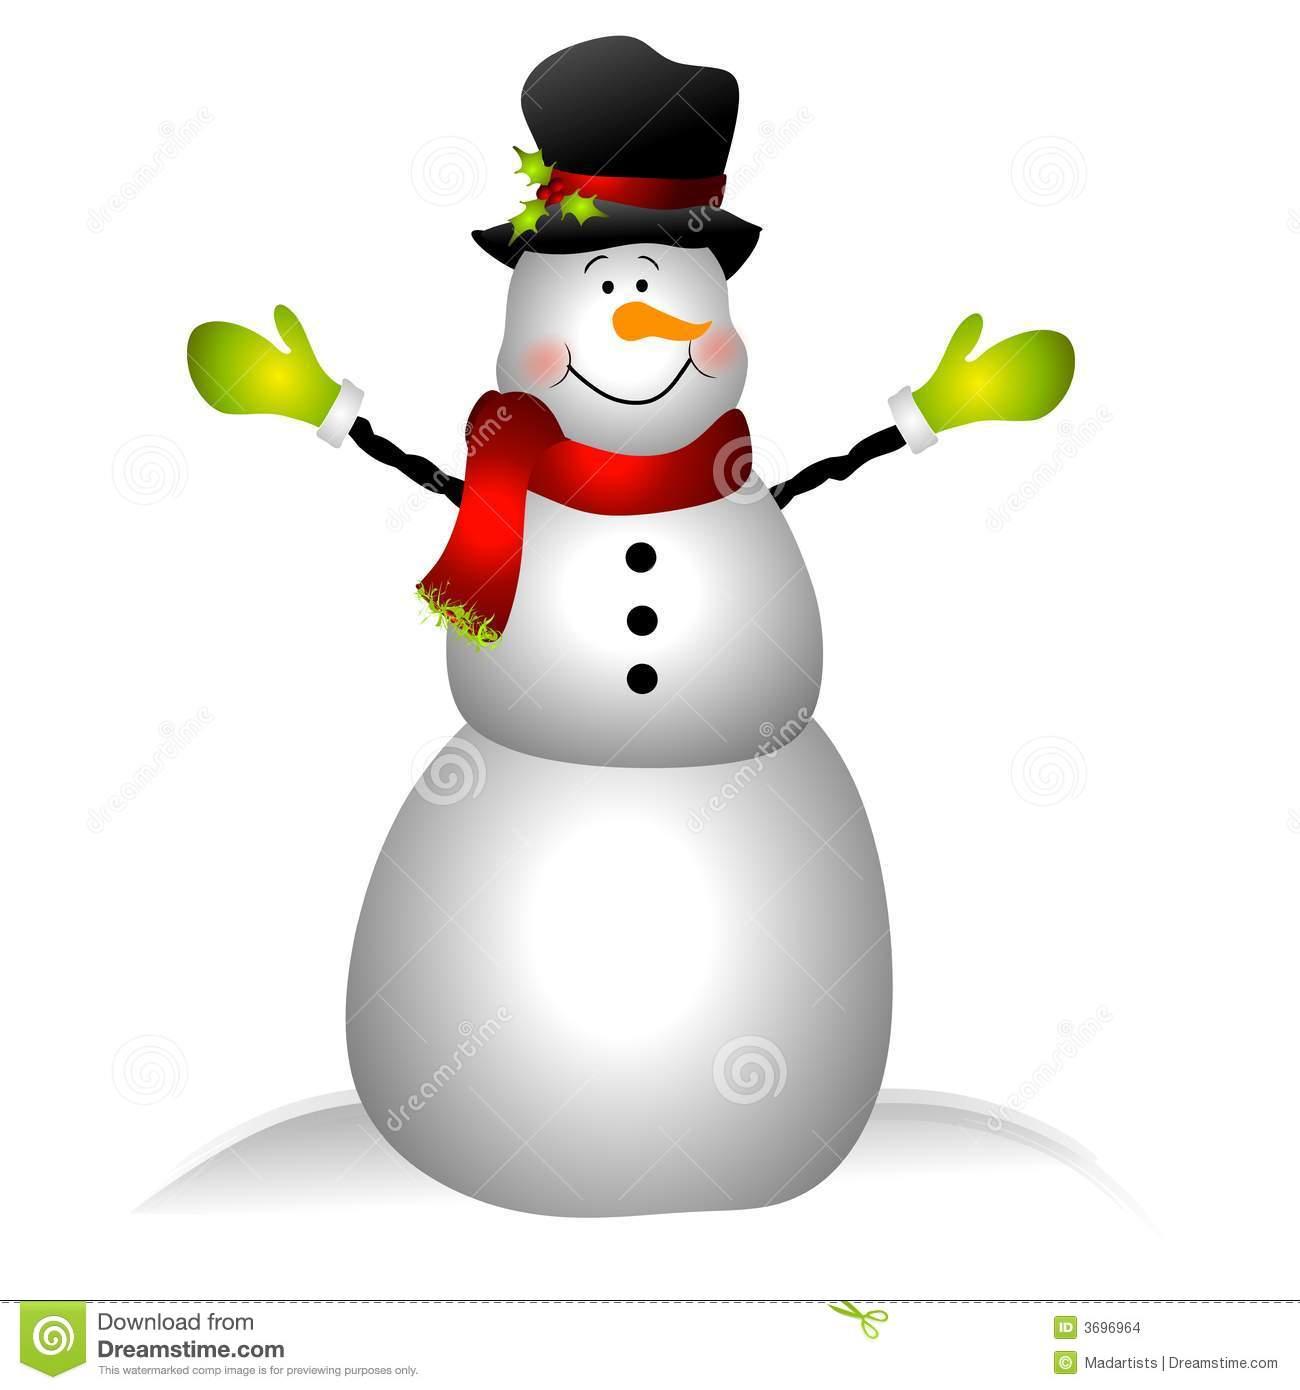 Snowman Face Clipart Free .-Snowman Face Clipart Free .-13